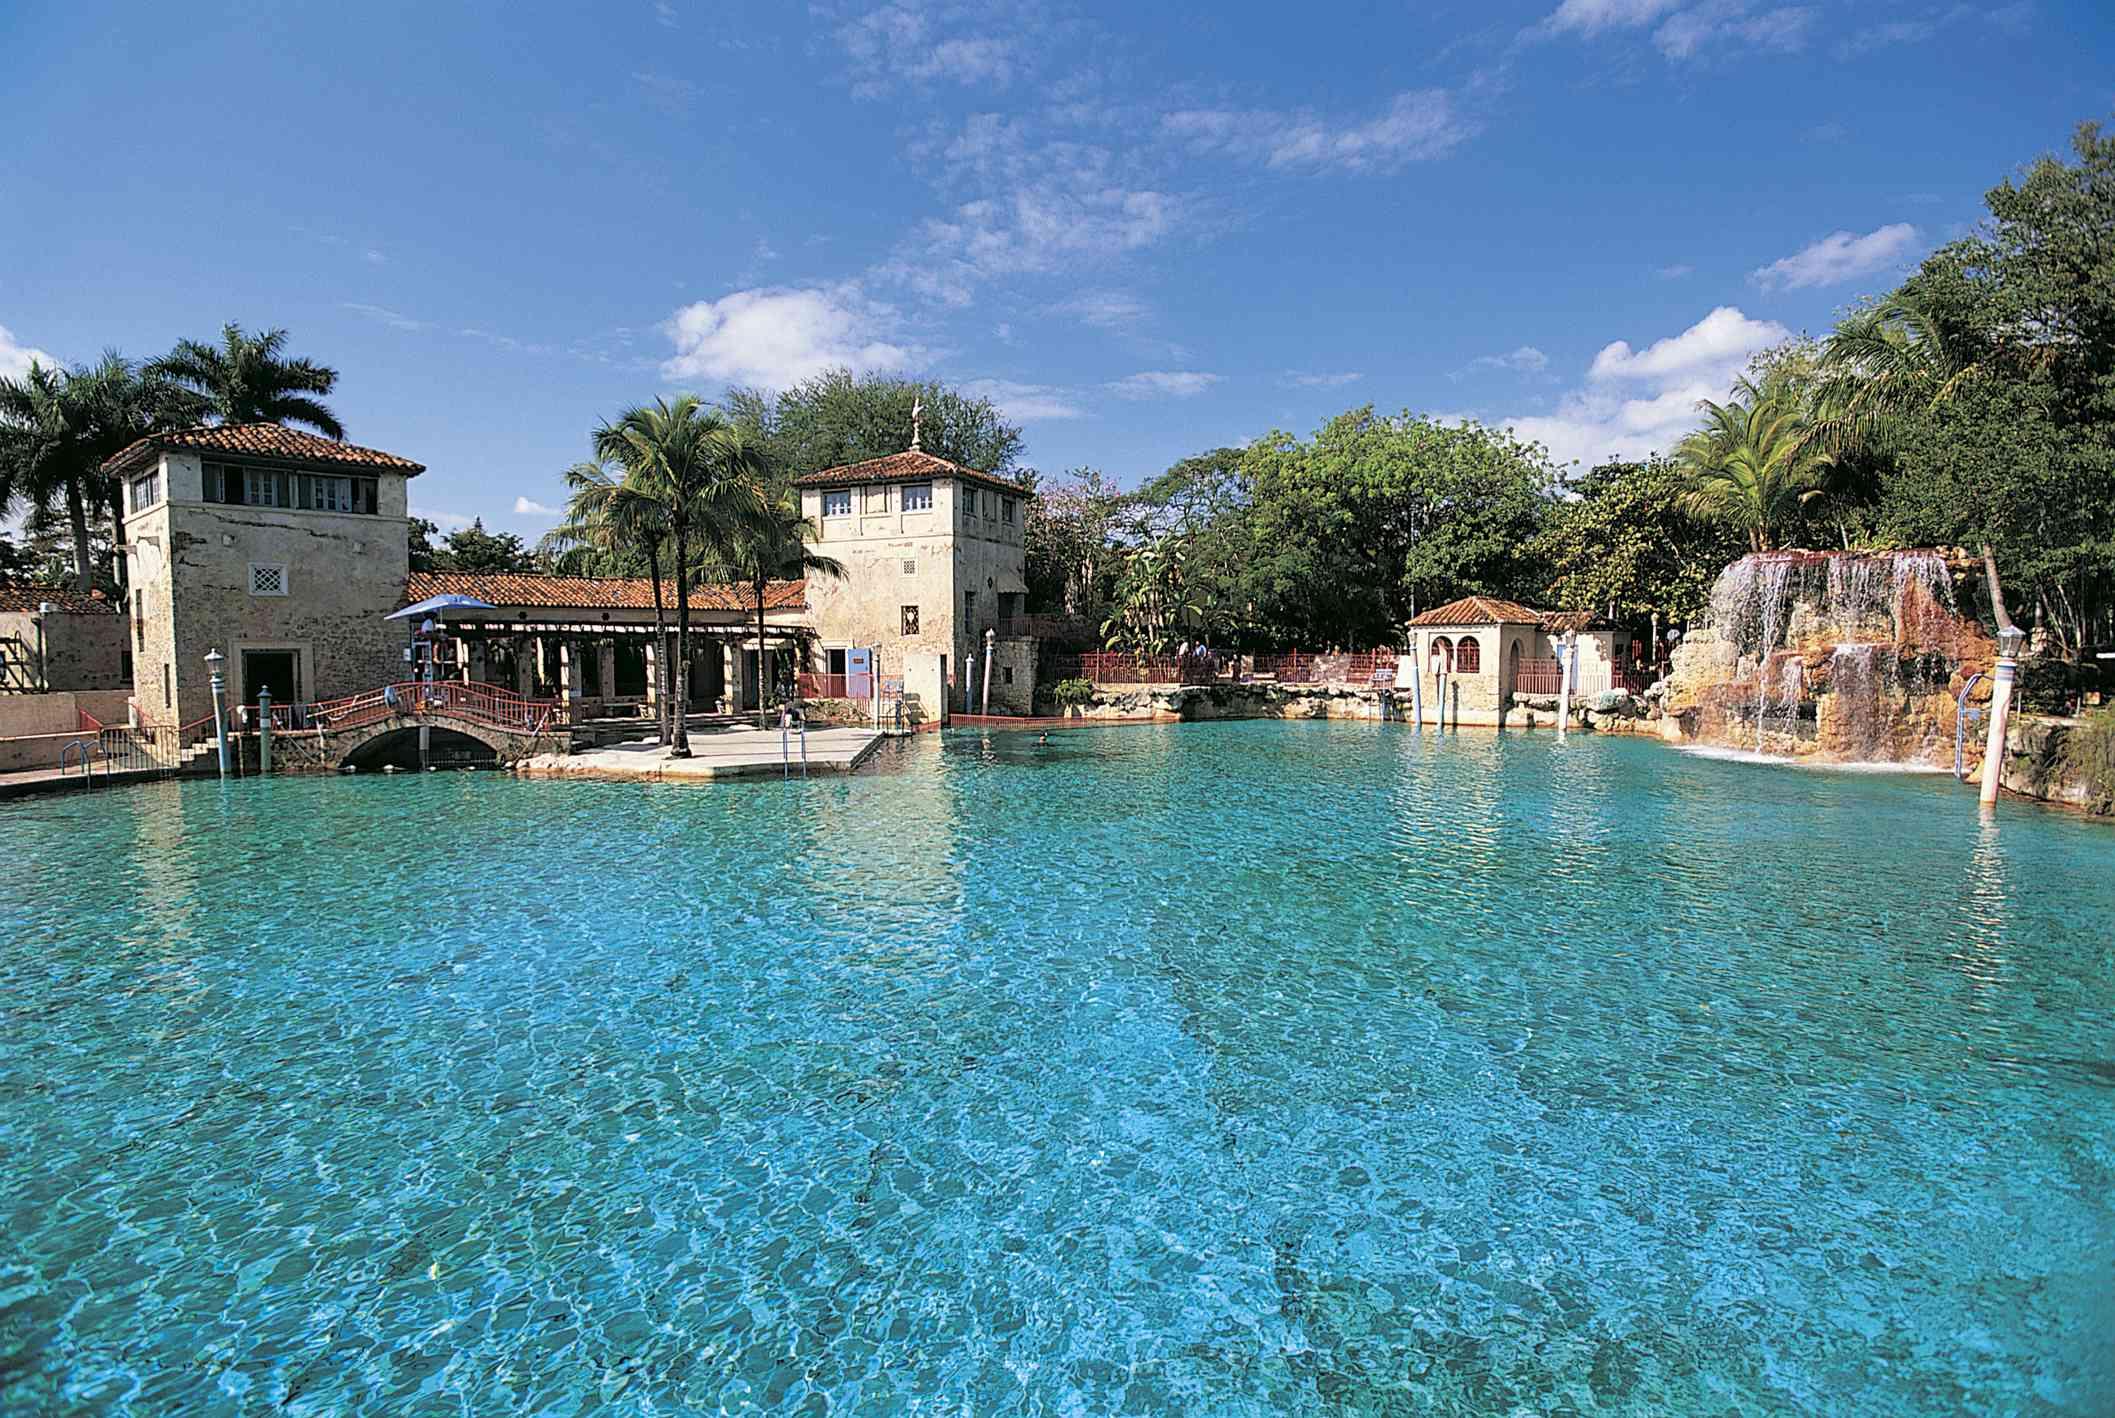 Empty Venetian Pool in Coral Gables, Miami